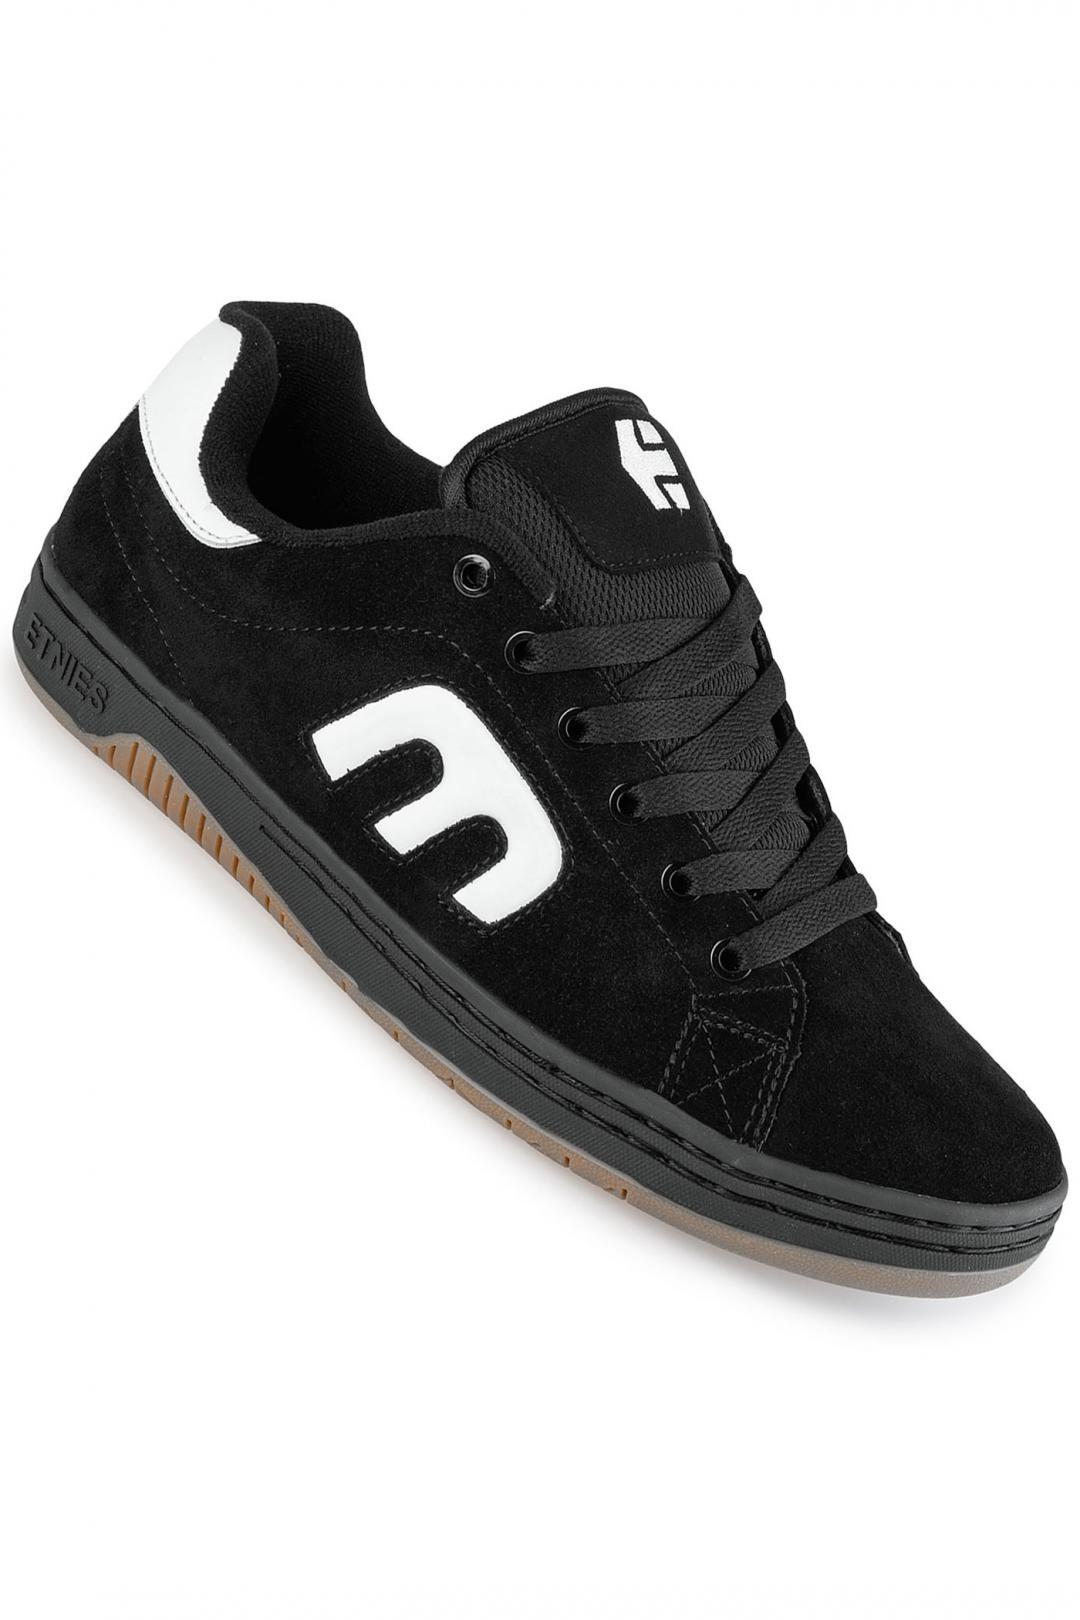 Uomo Etnies Calli-Cut black white black | Sneakers low top